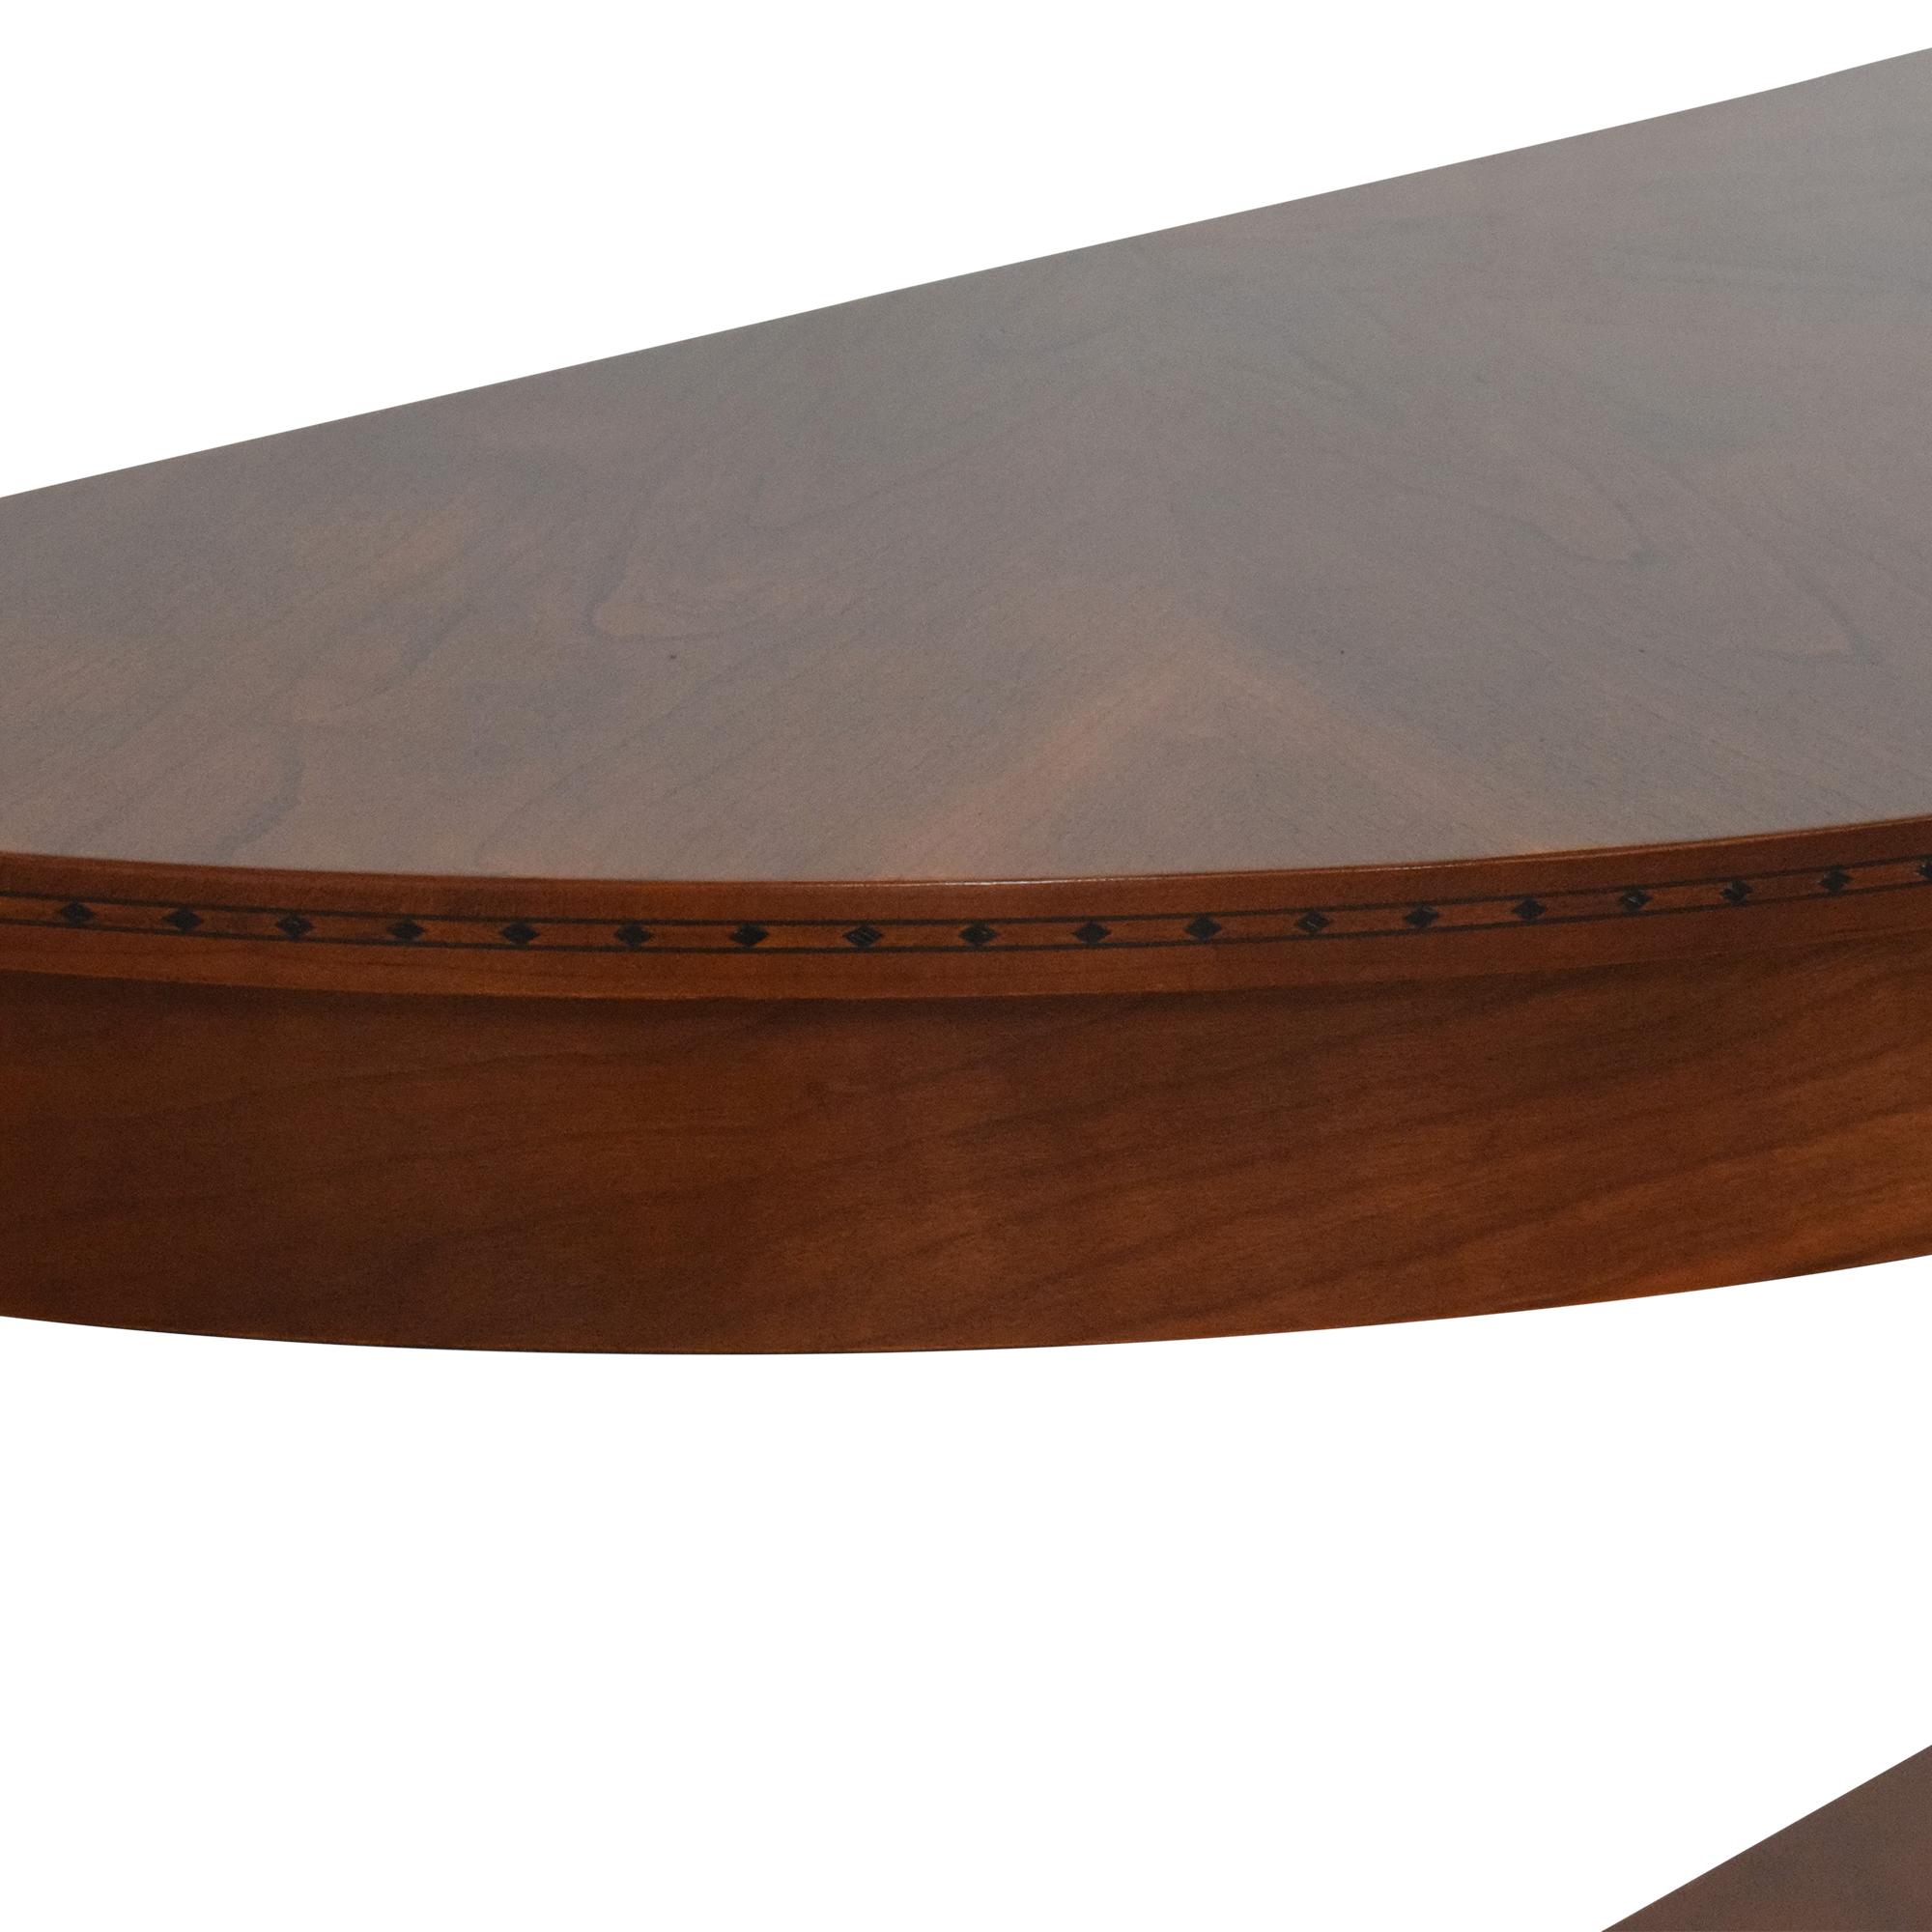 Ethan Allen Medallion Crescent Console Table / Accent Tables